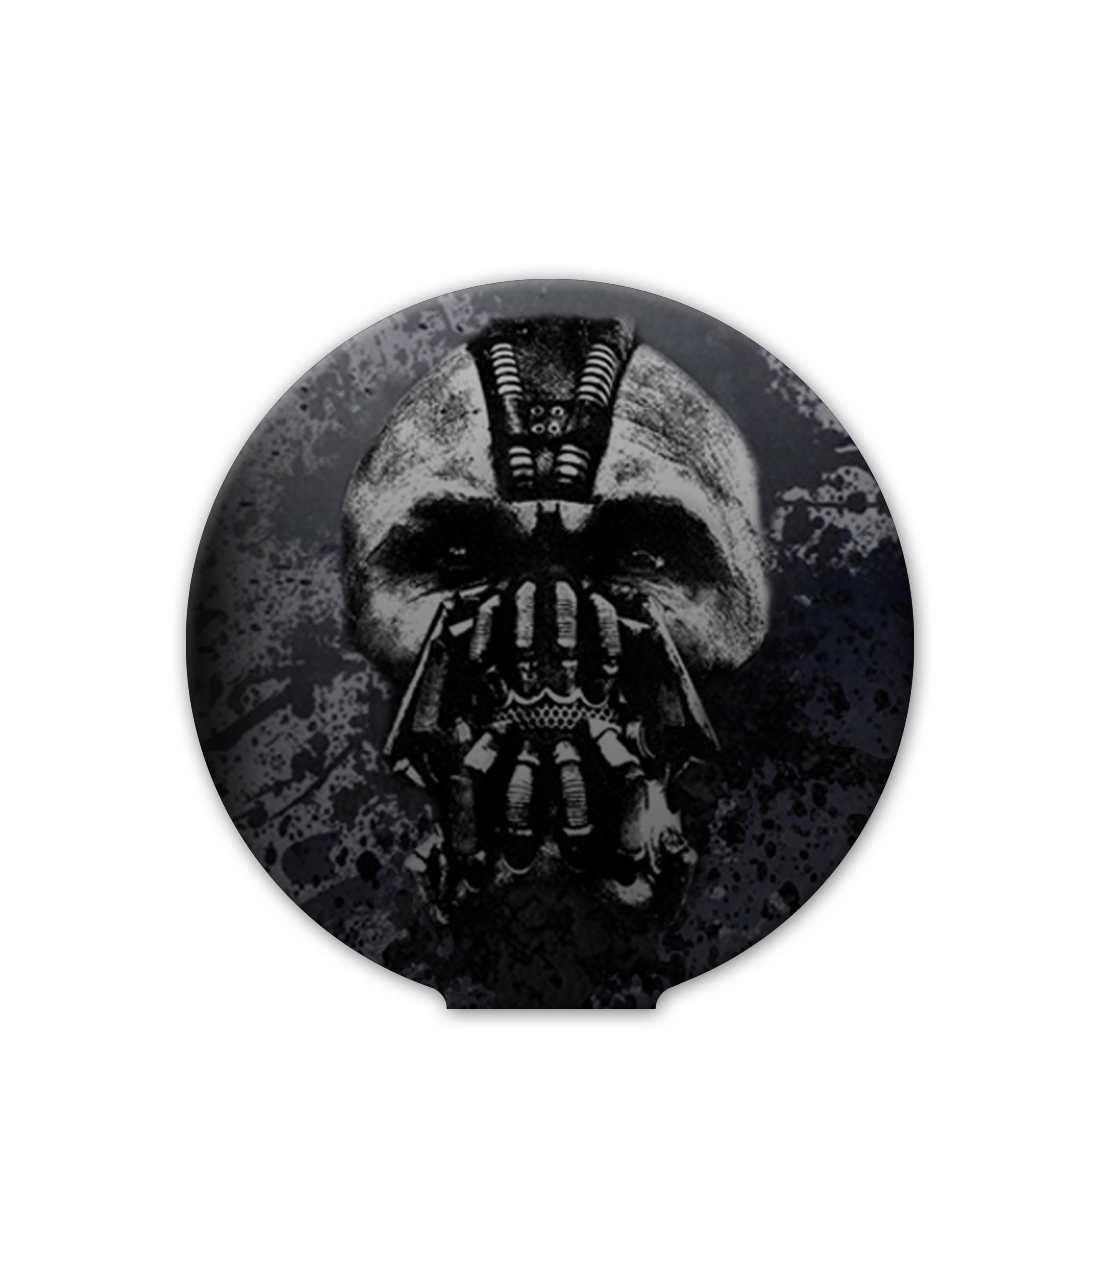 Bane is Watching - Macmerise Sticky Pad